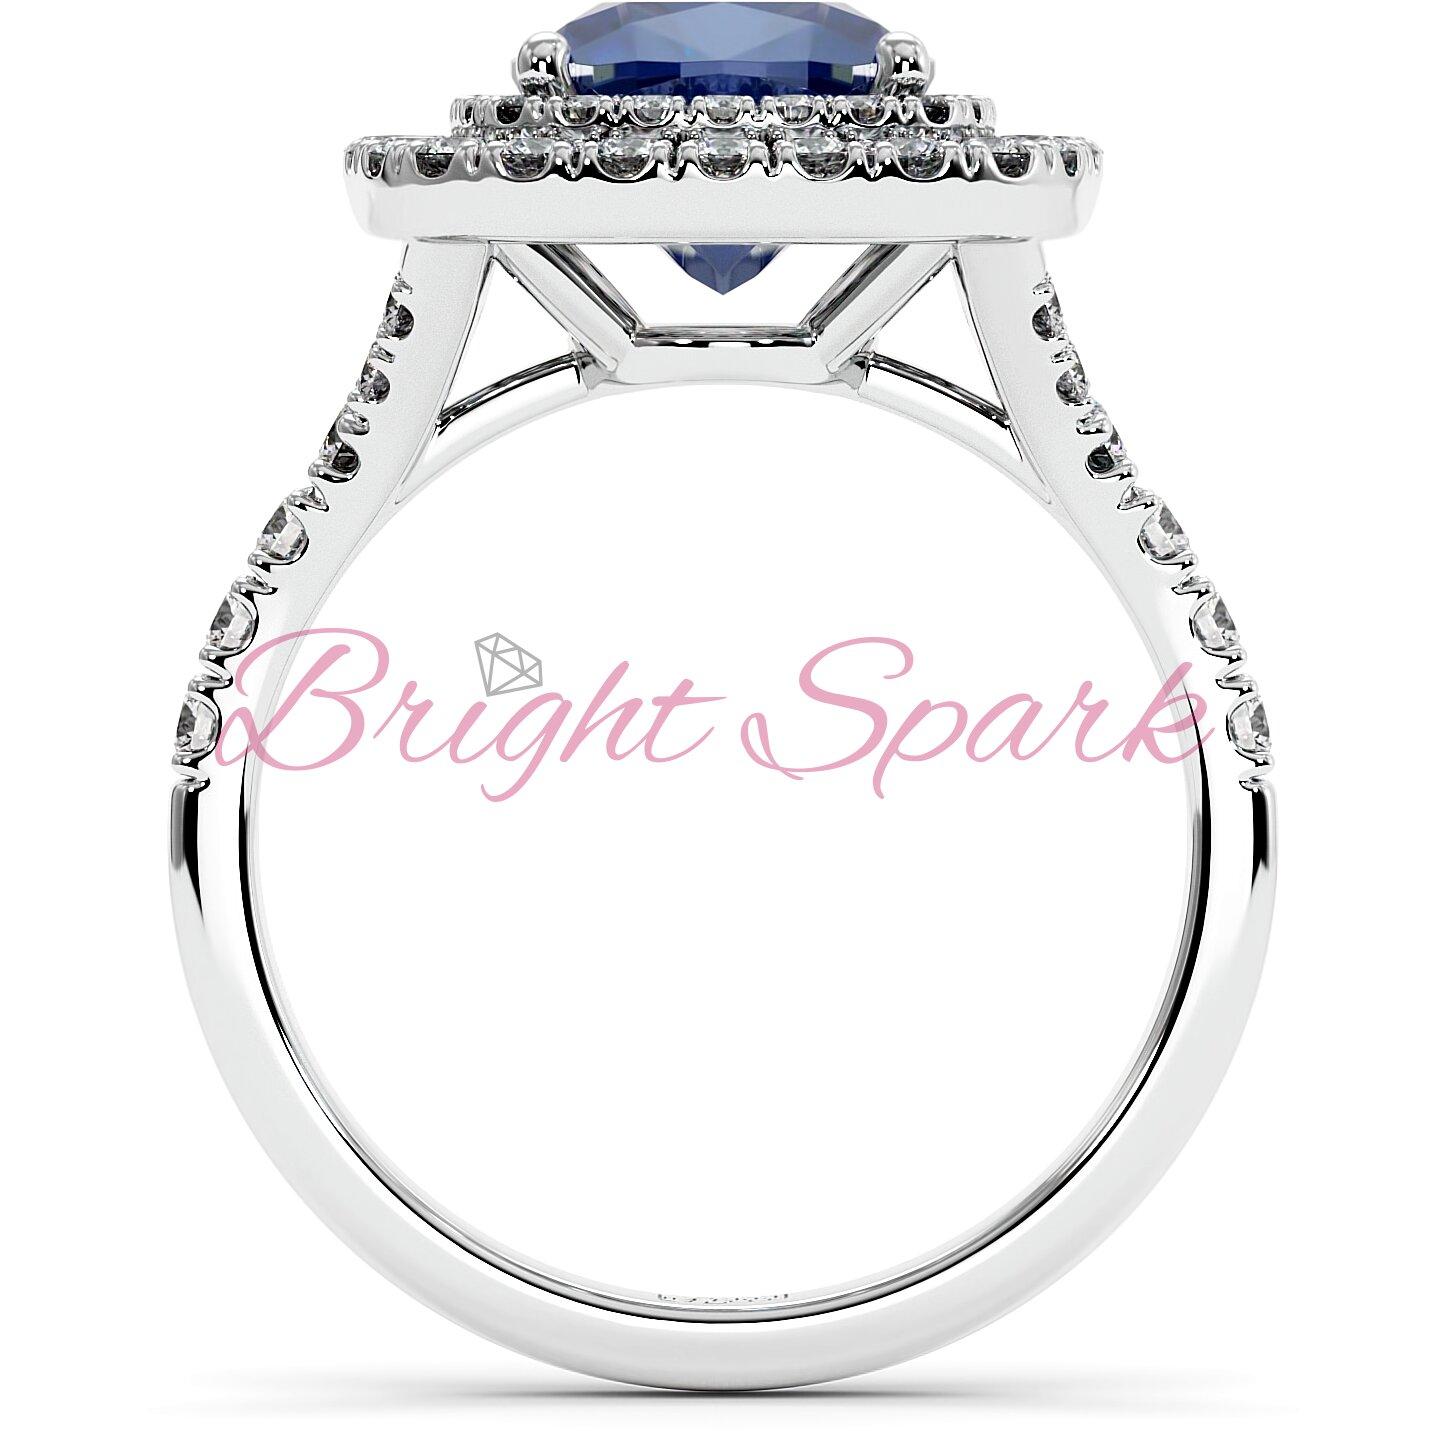 Золотое кольцо с синим сапфиром кушон в ореоле с дорожкой Soul на 2,9 карата